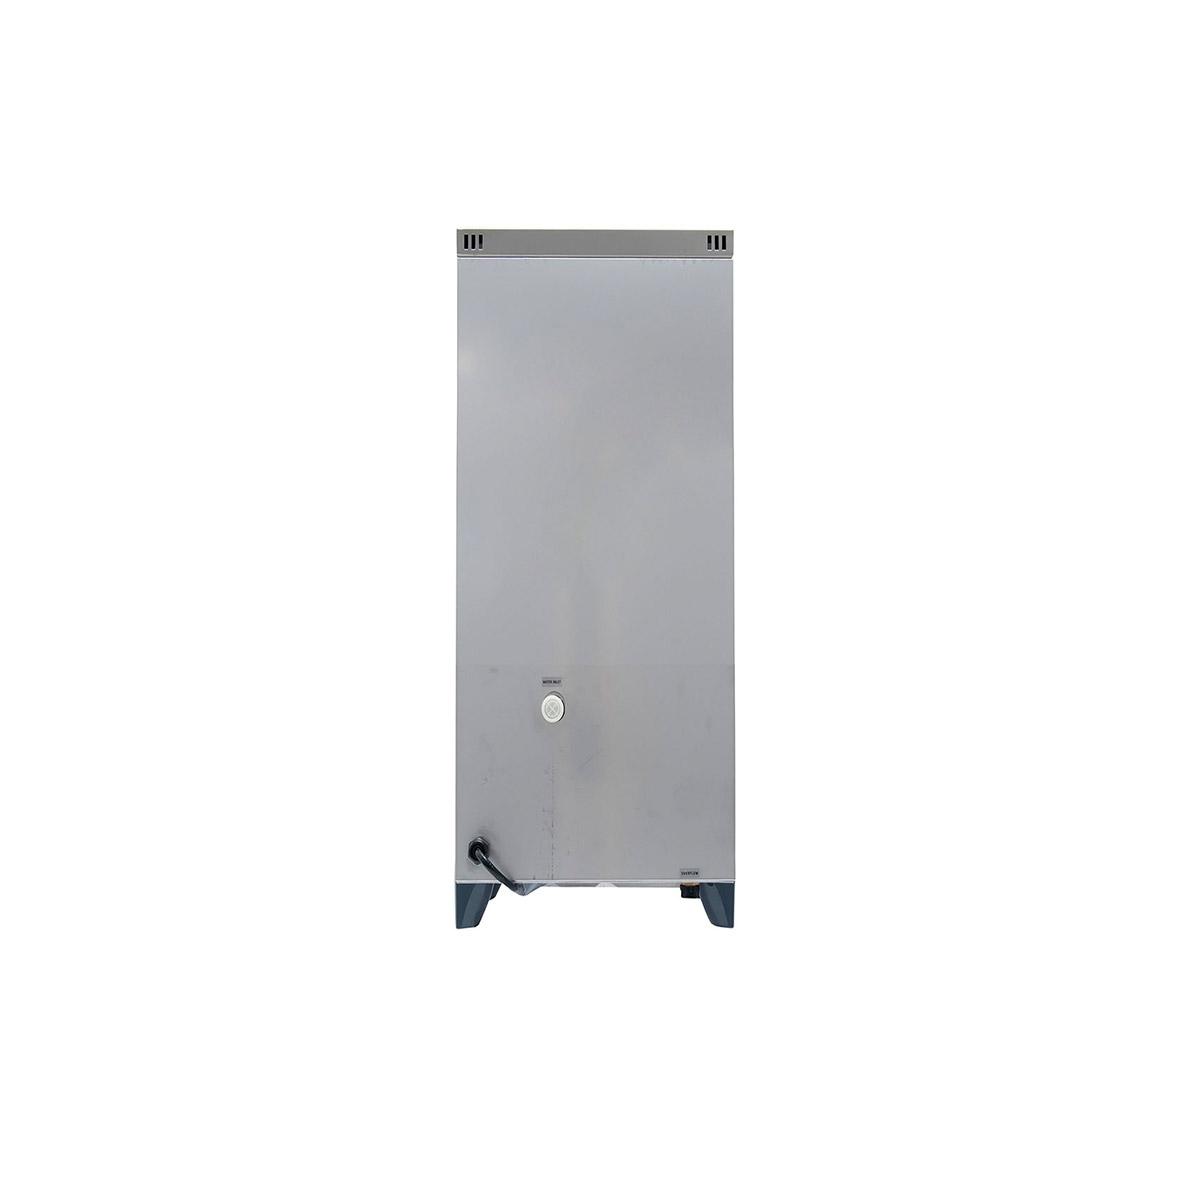 Instanta Sureflow Plus Counter Top Water Boiler CTSP19HT/6 High Twin Taps Filtered 19Ltr